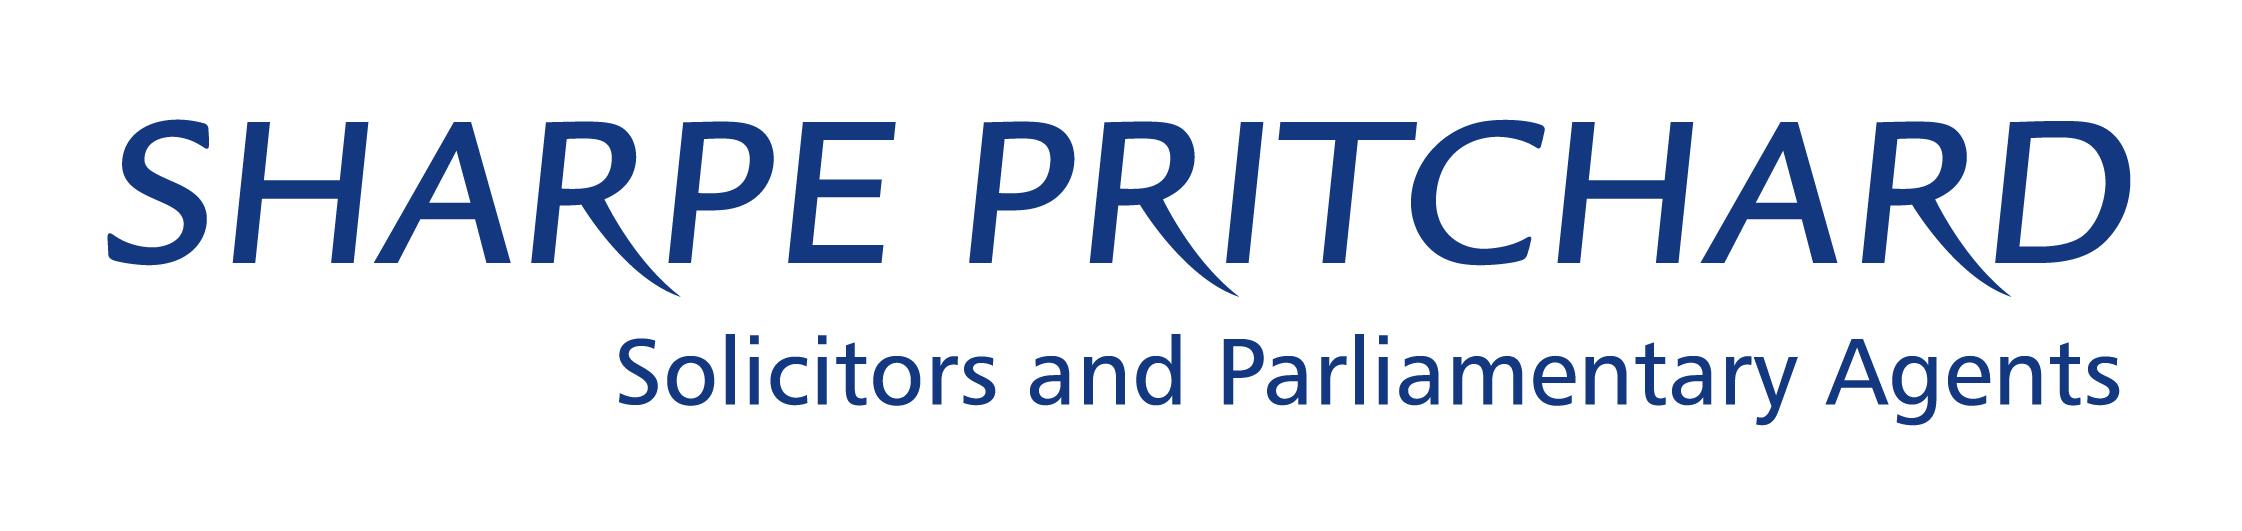 Sharpe Pritchard Logo